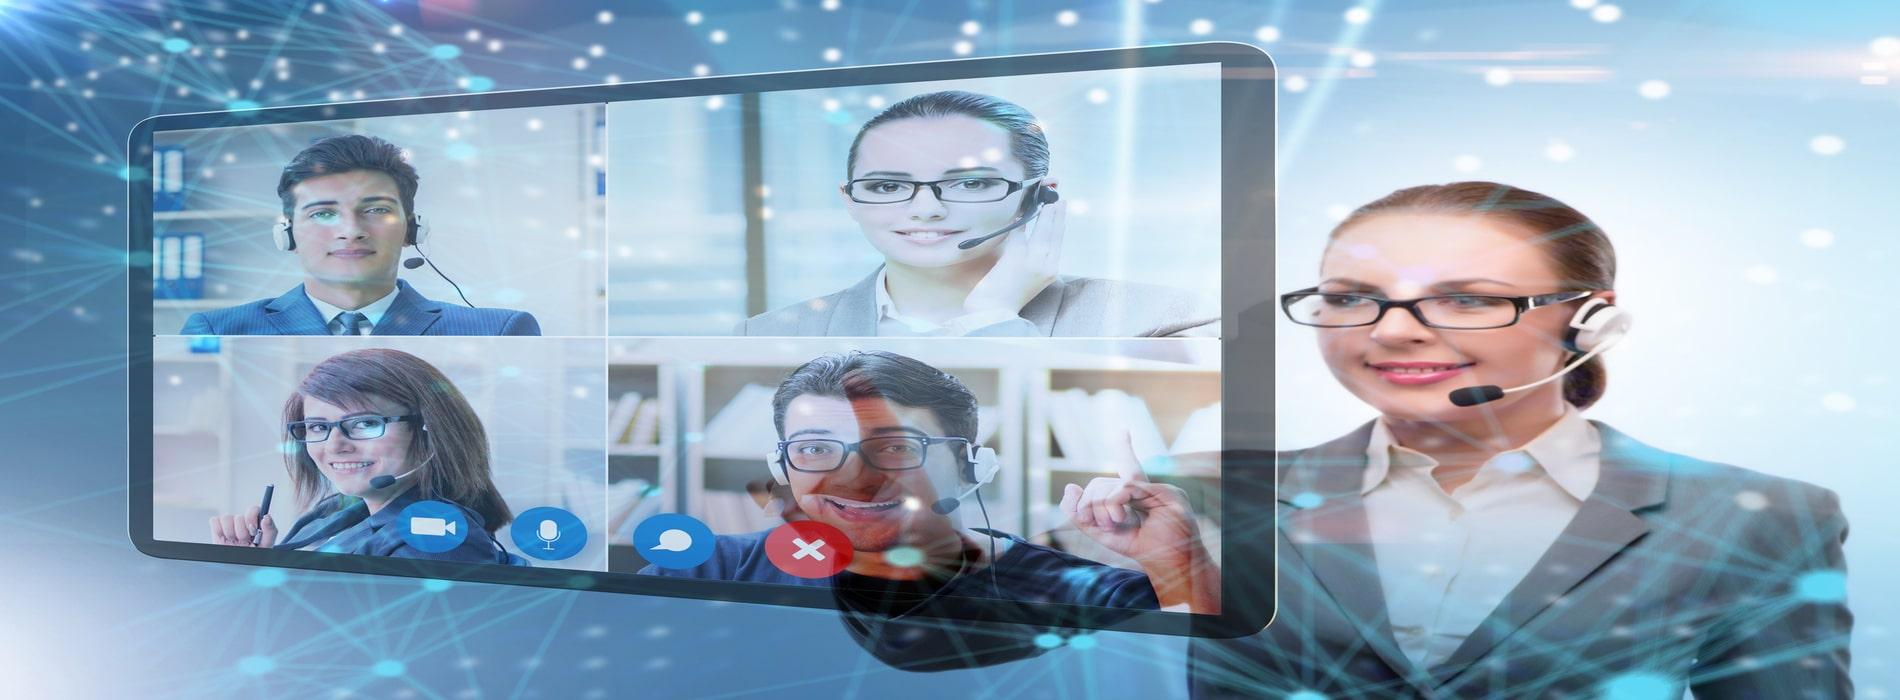 Video Remote Interpretation Services